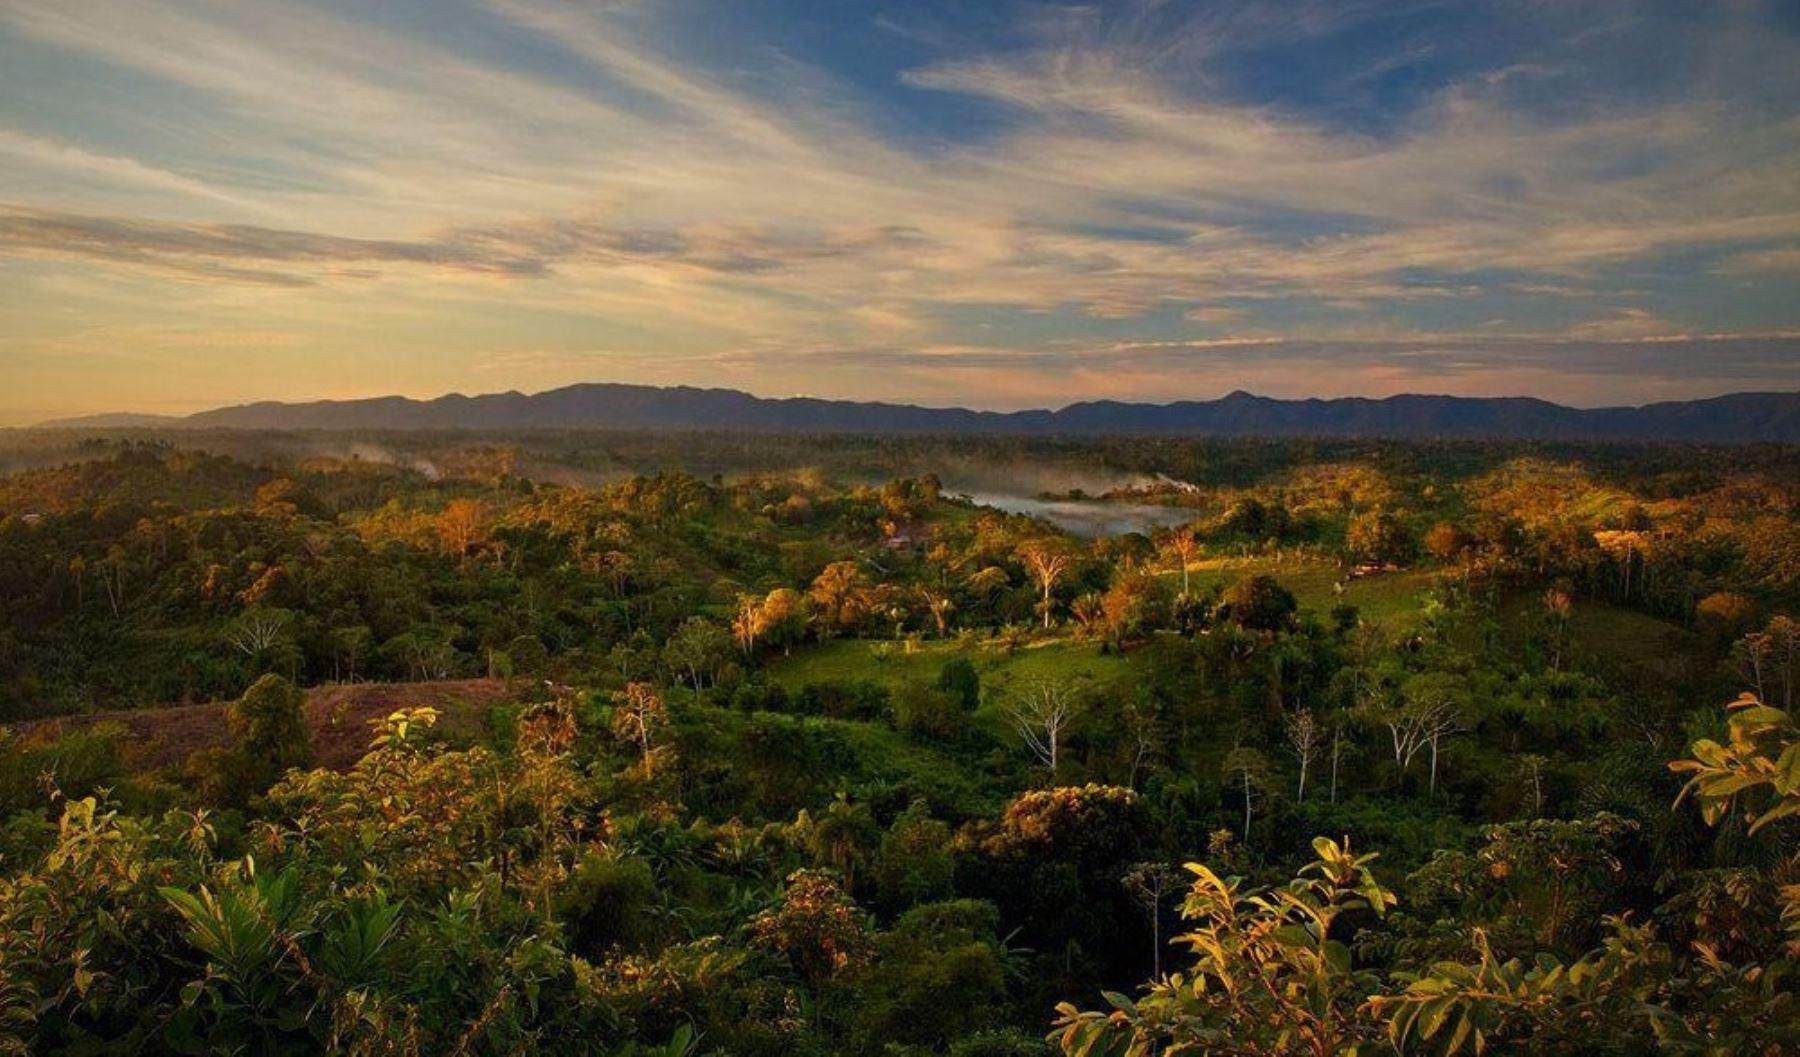 Parque Nacional Sierra del Divisor. Foto: Facebook/Parque Nacional Sierra del Divisor.